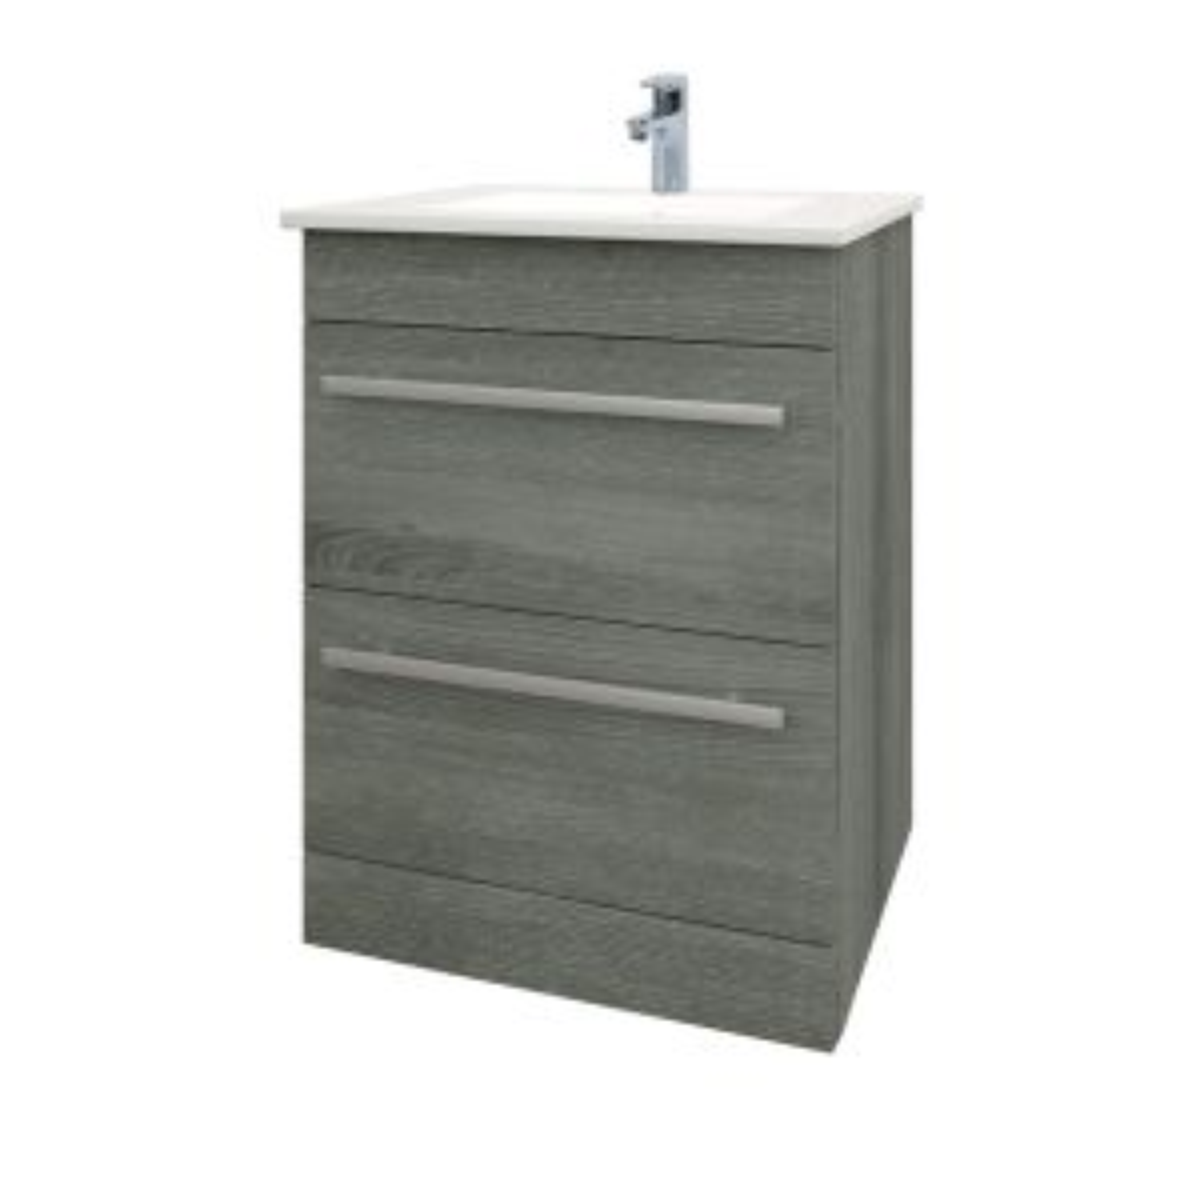 Kartell Purity Grey Ash 2 Drawer Floor Standing Vanity Unit 600mm